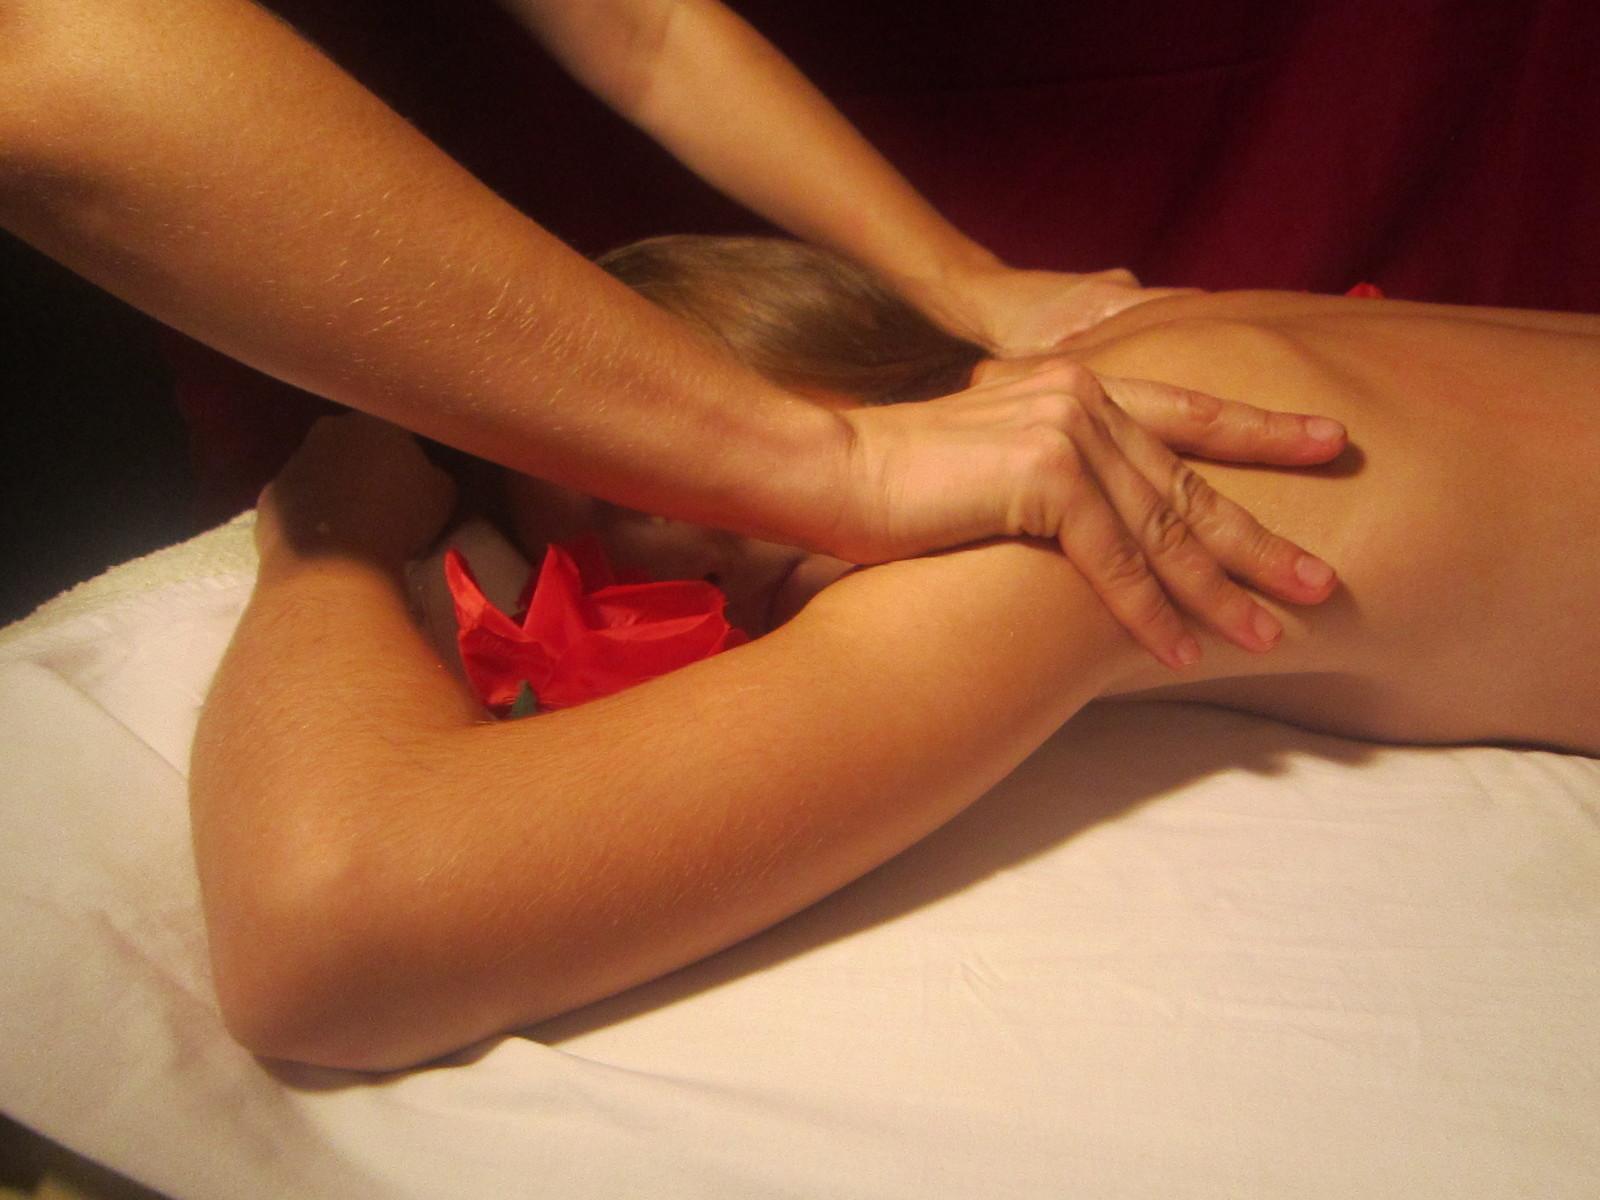 Всякий индивидуалки массаж химки если